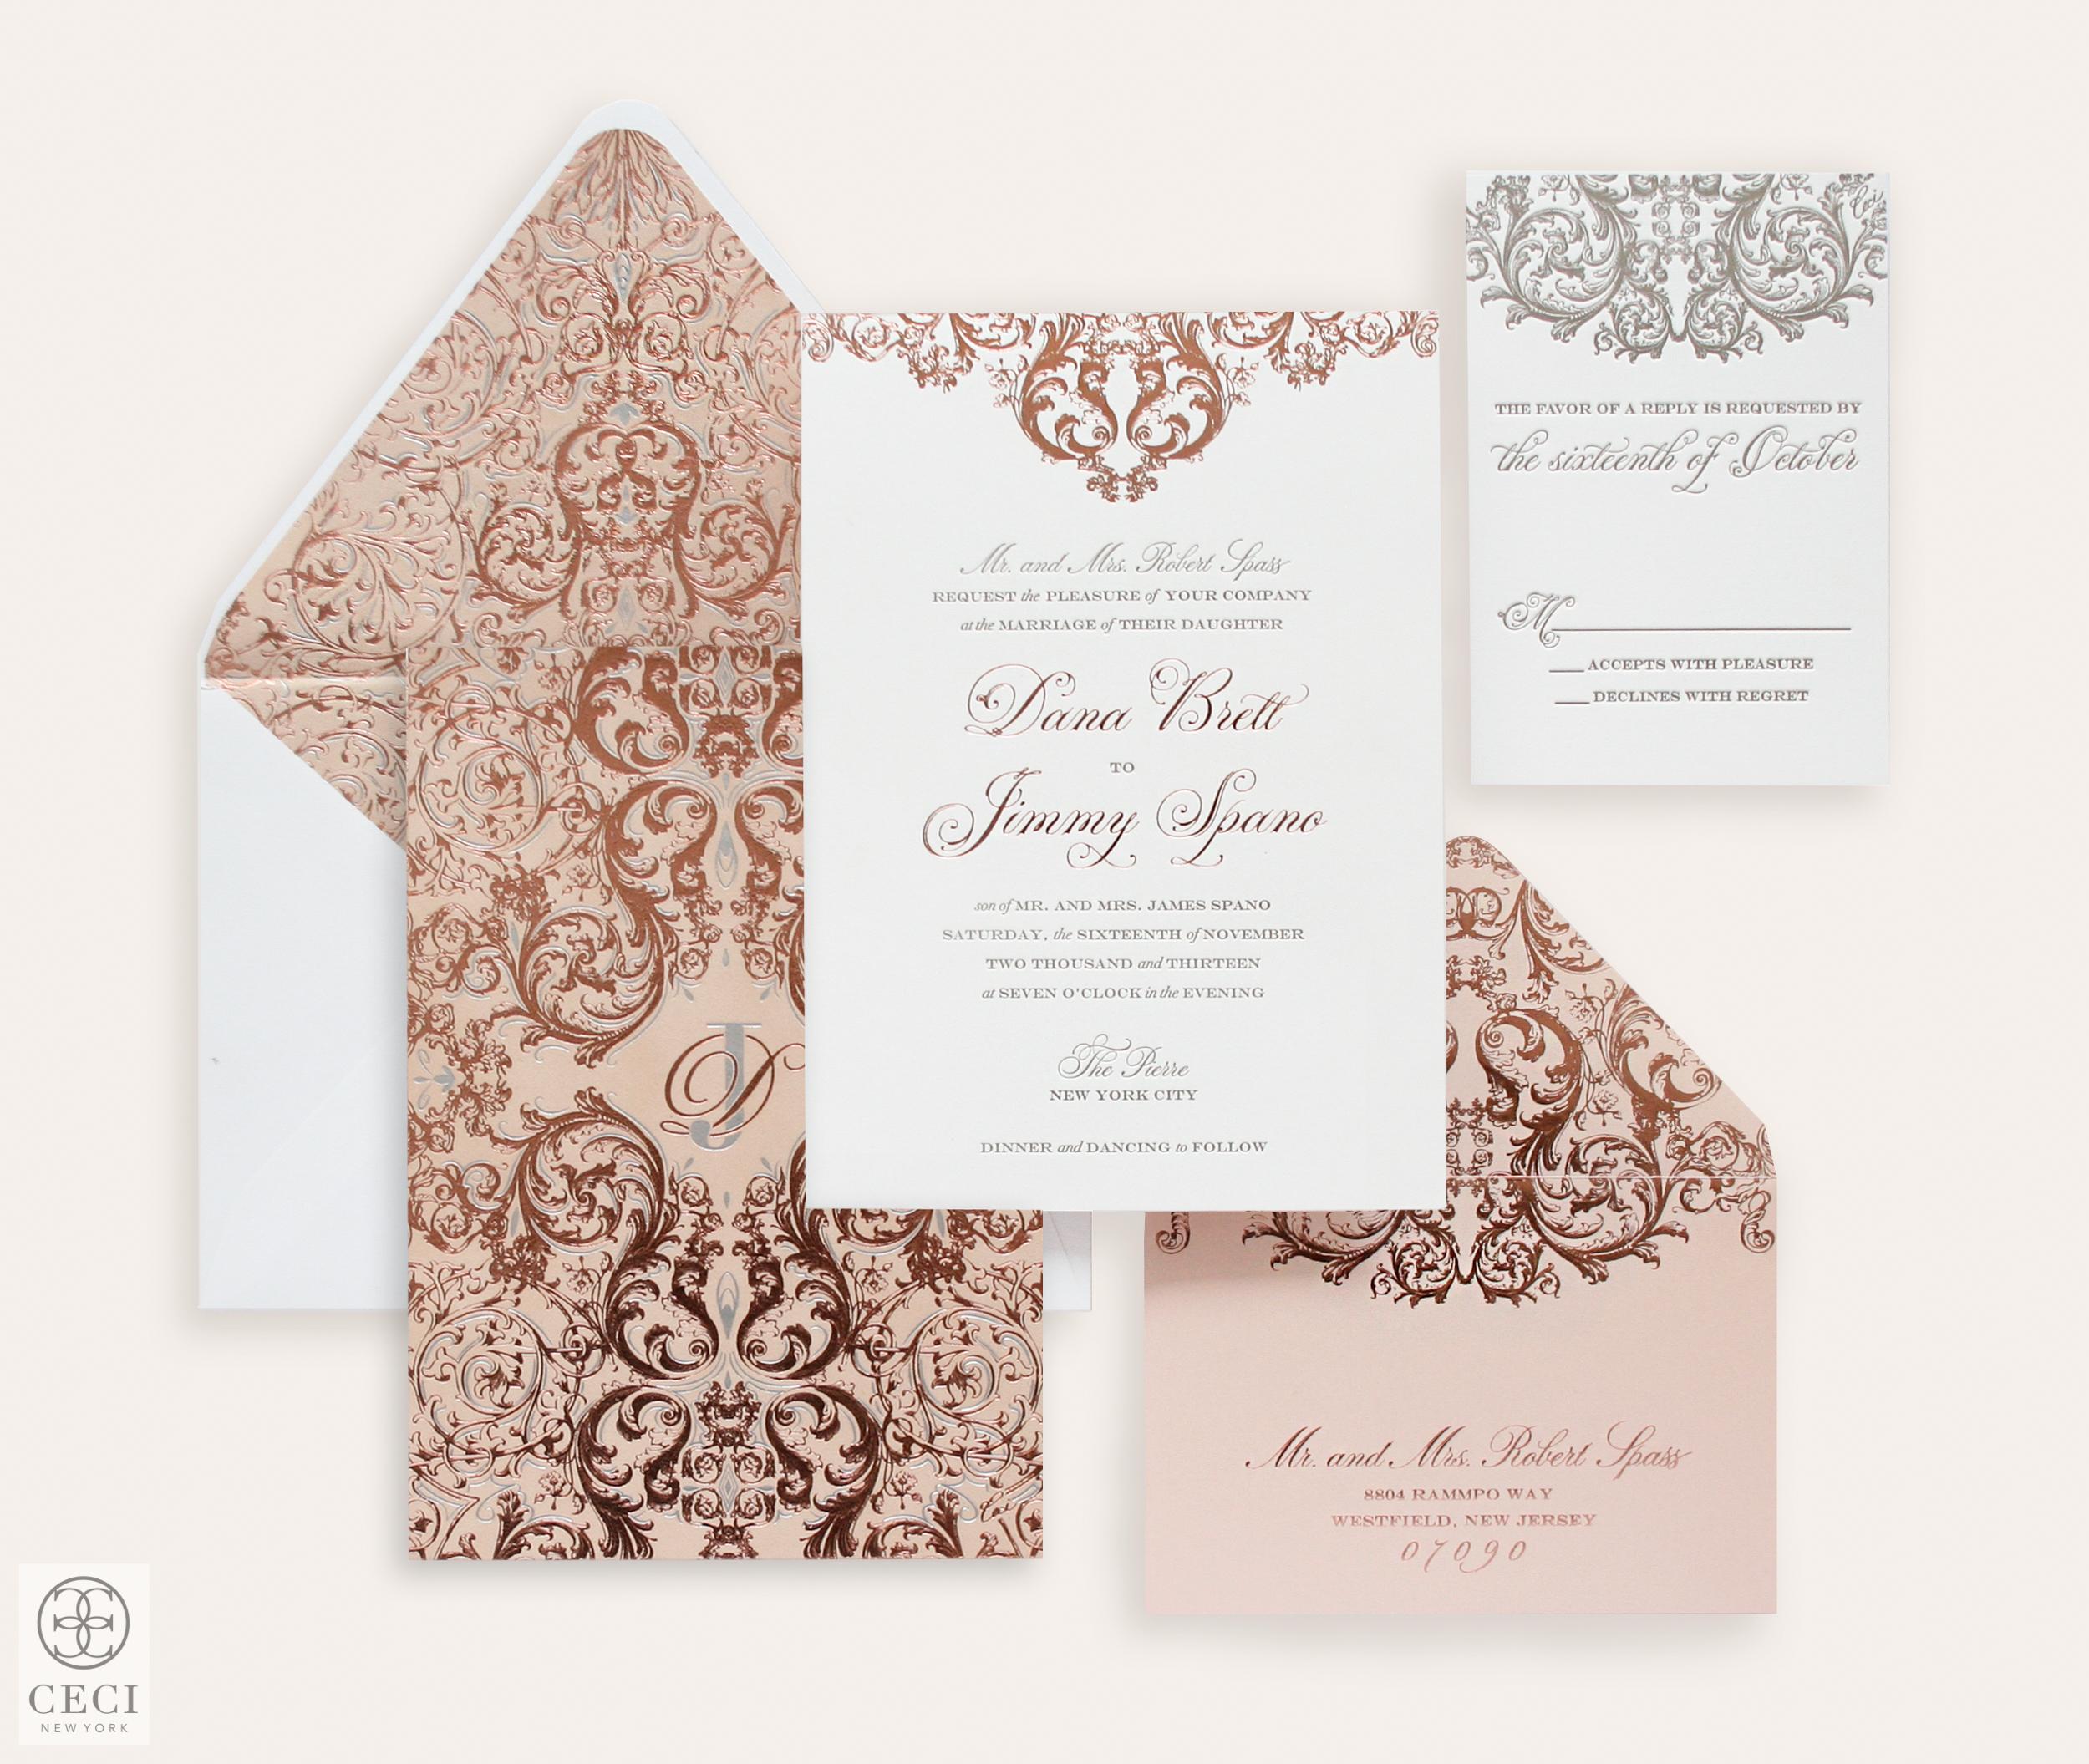 Ceci_New_York_Christian_Oth_CeciStyle_Pierre_New_York_City_Wedding_Luxury_Custom_Invitations_Personalized_Rose_Gold_Blush_Bride_-12.jpg